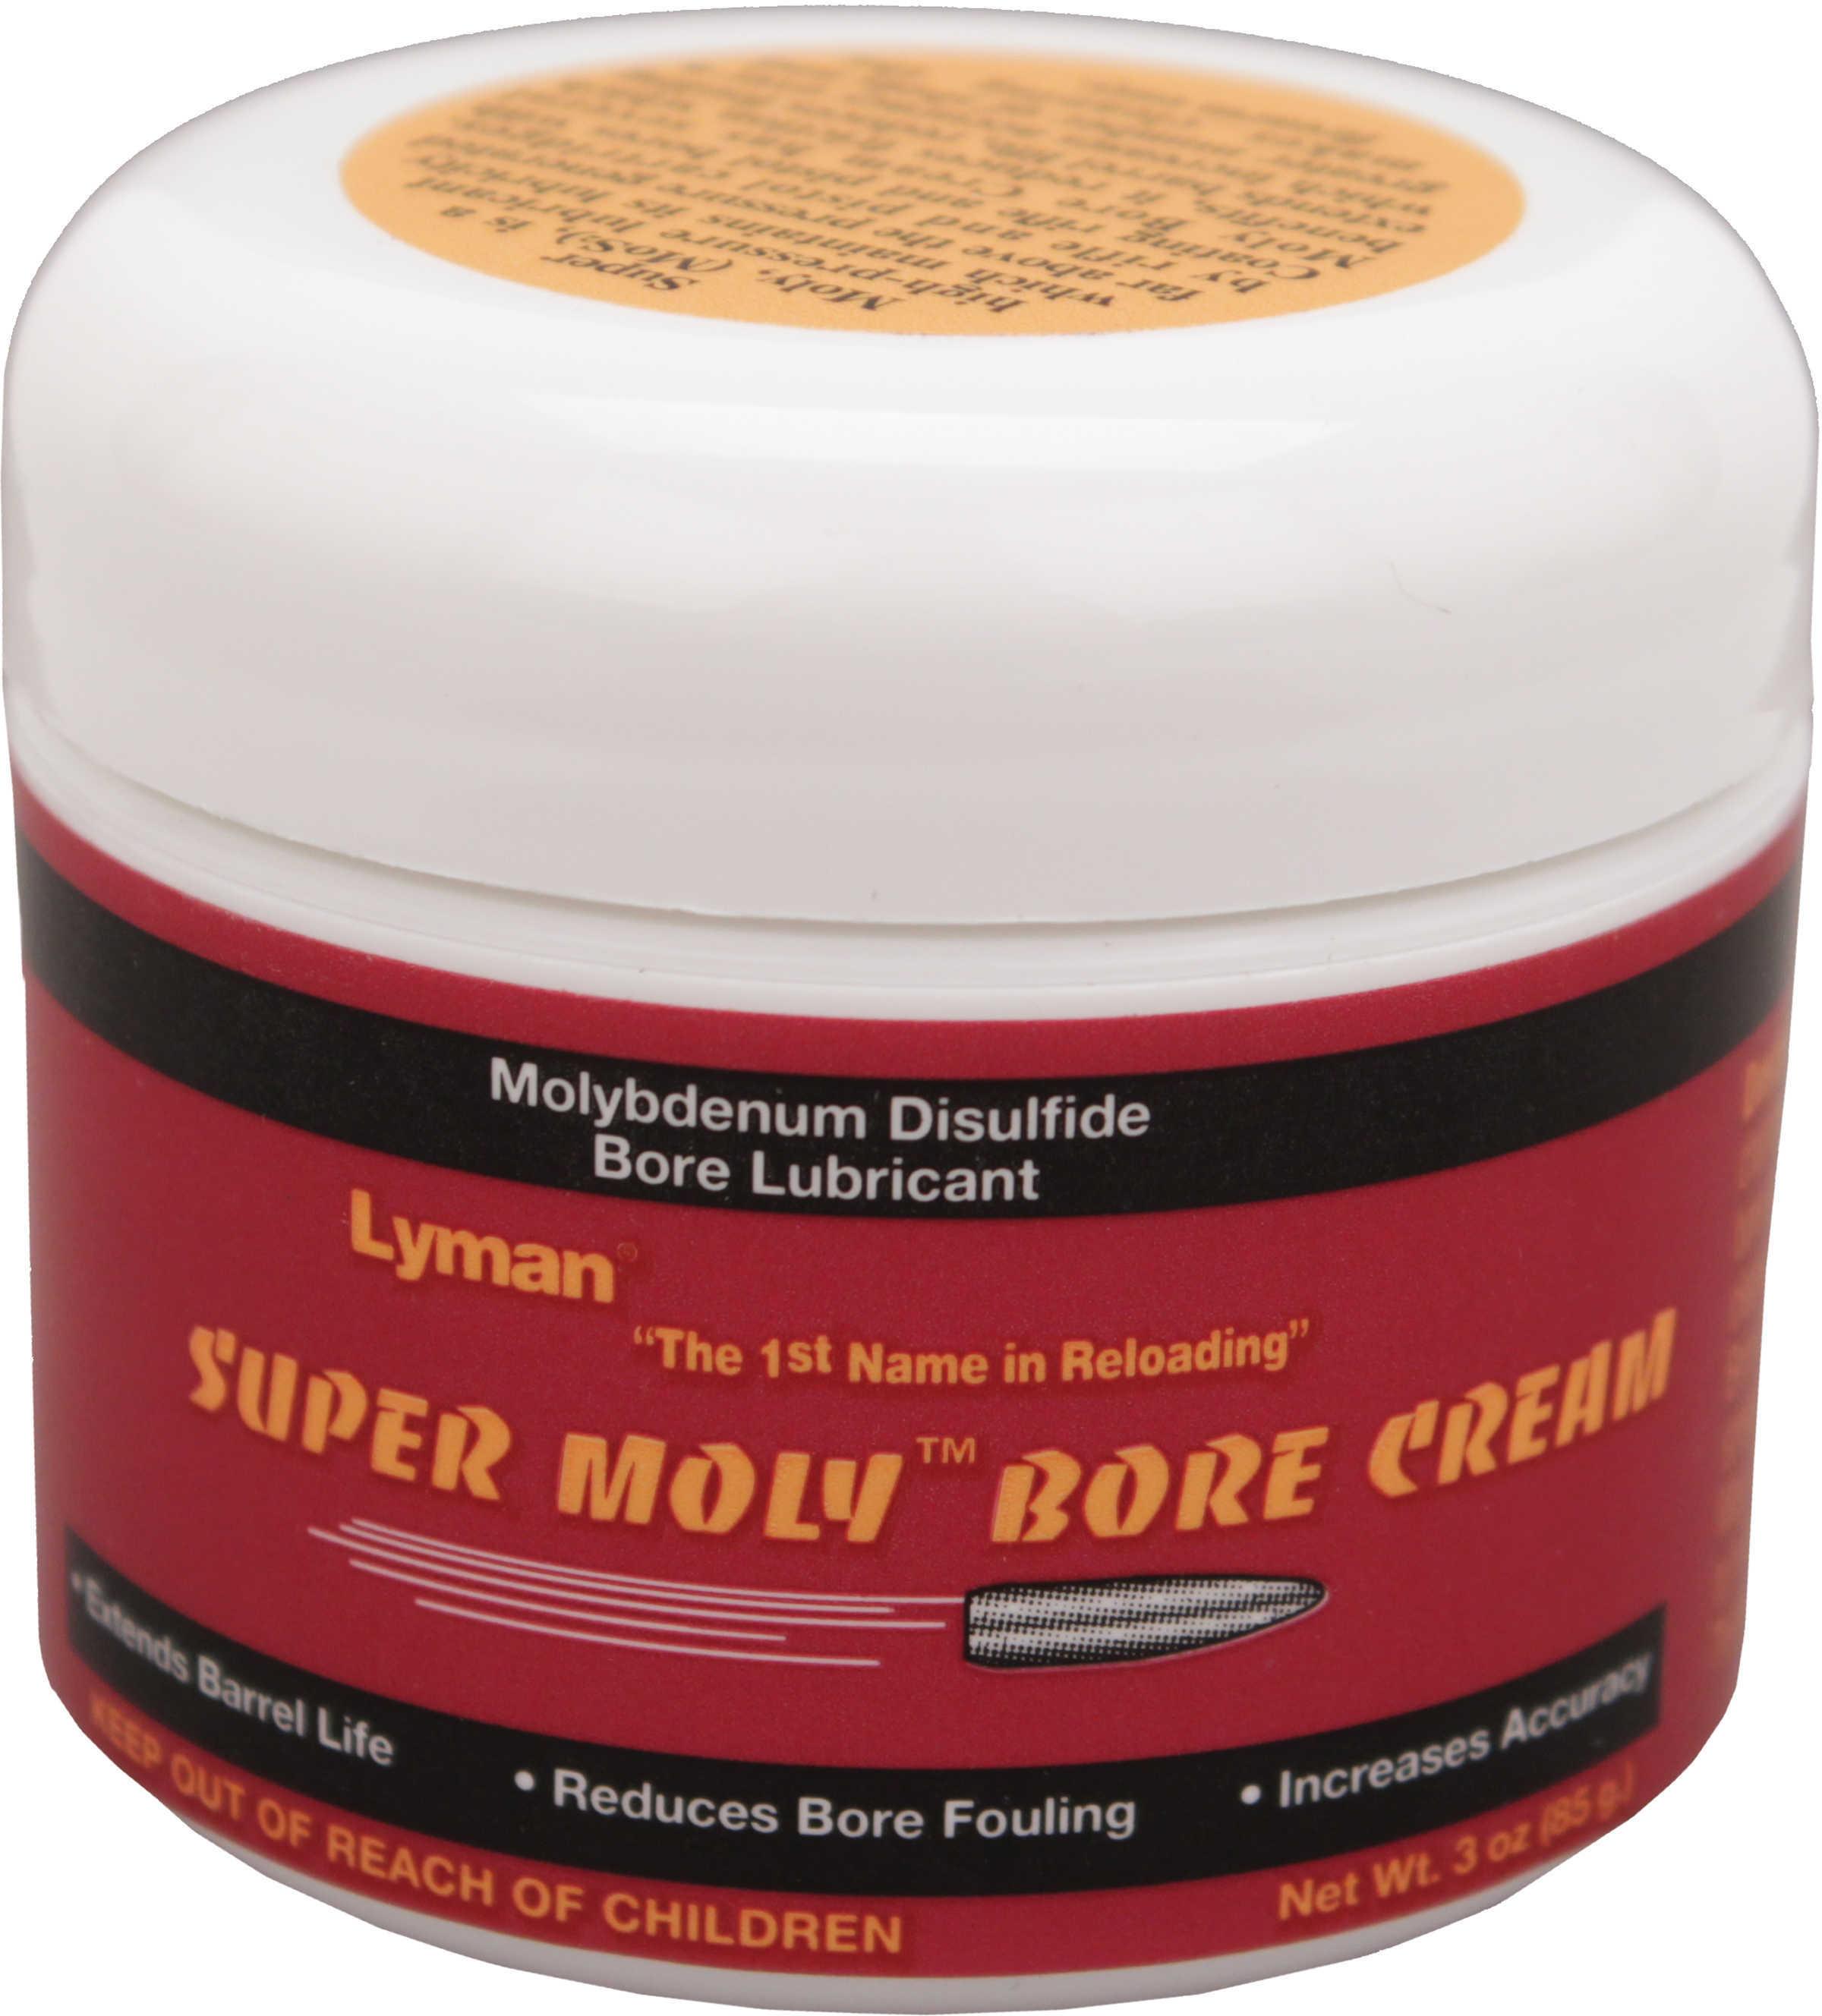 Lyman Super Moly Bore Cream 3 Oz